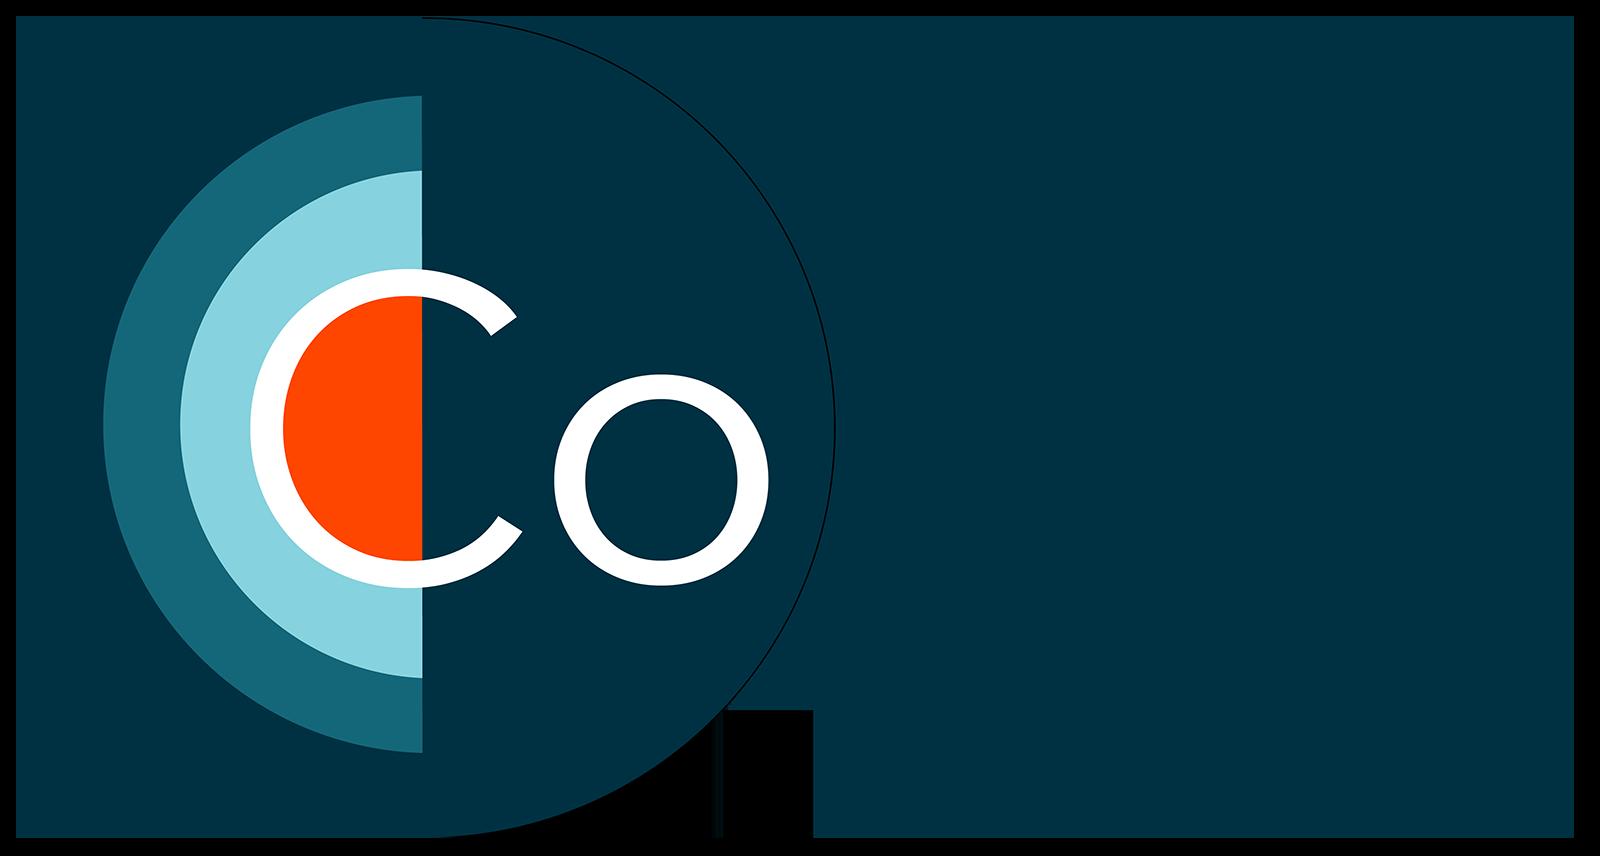 Confirmable Reproducible Research Environment